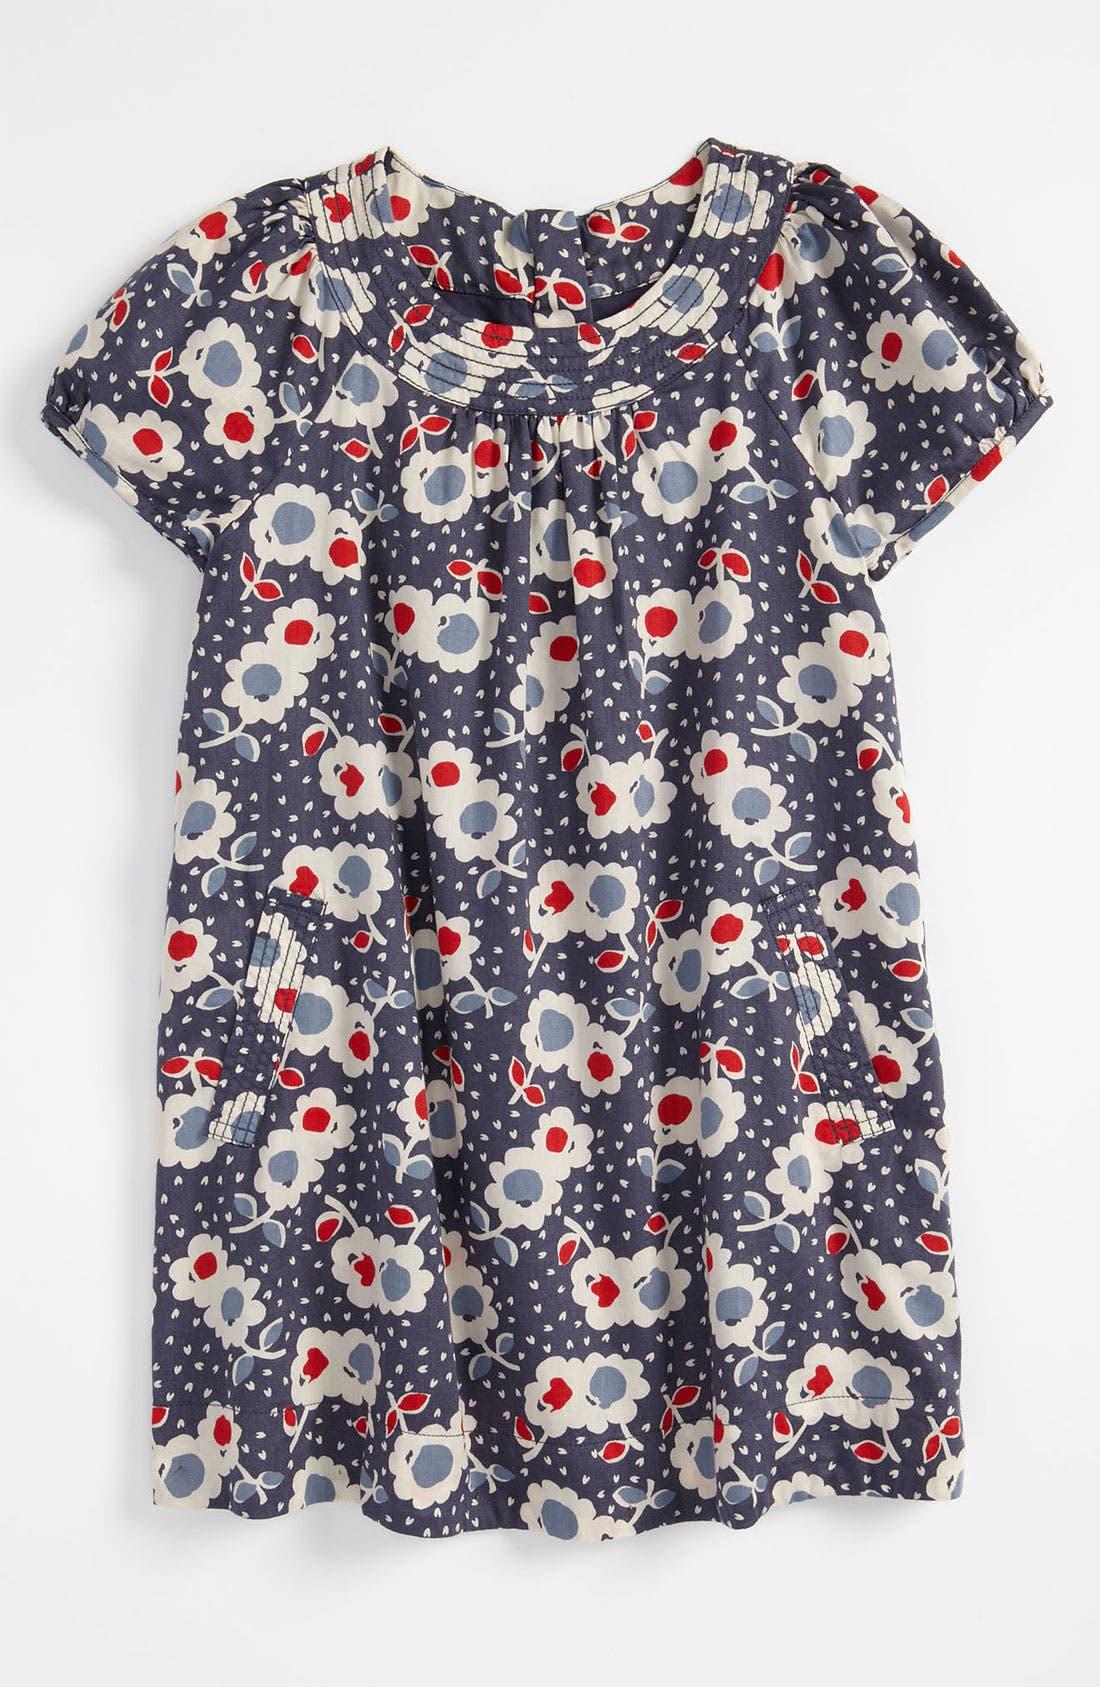 Alternate Image 1 Selected - Mini Boden 'Fun' Print Dress (Little Girls & Big Girls)